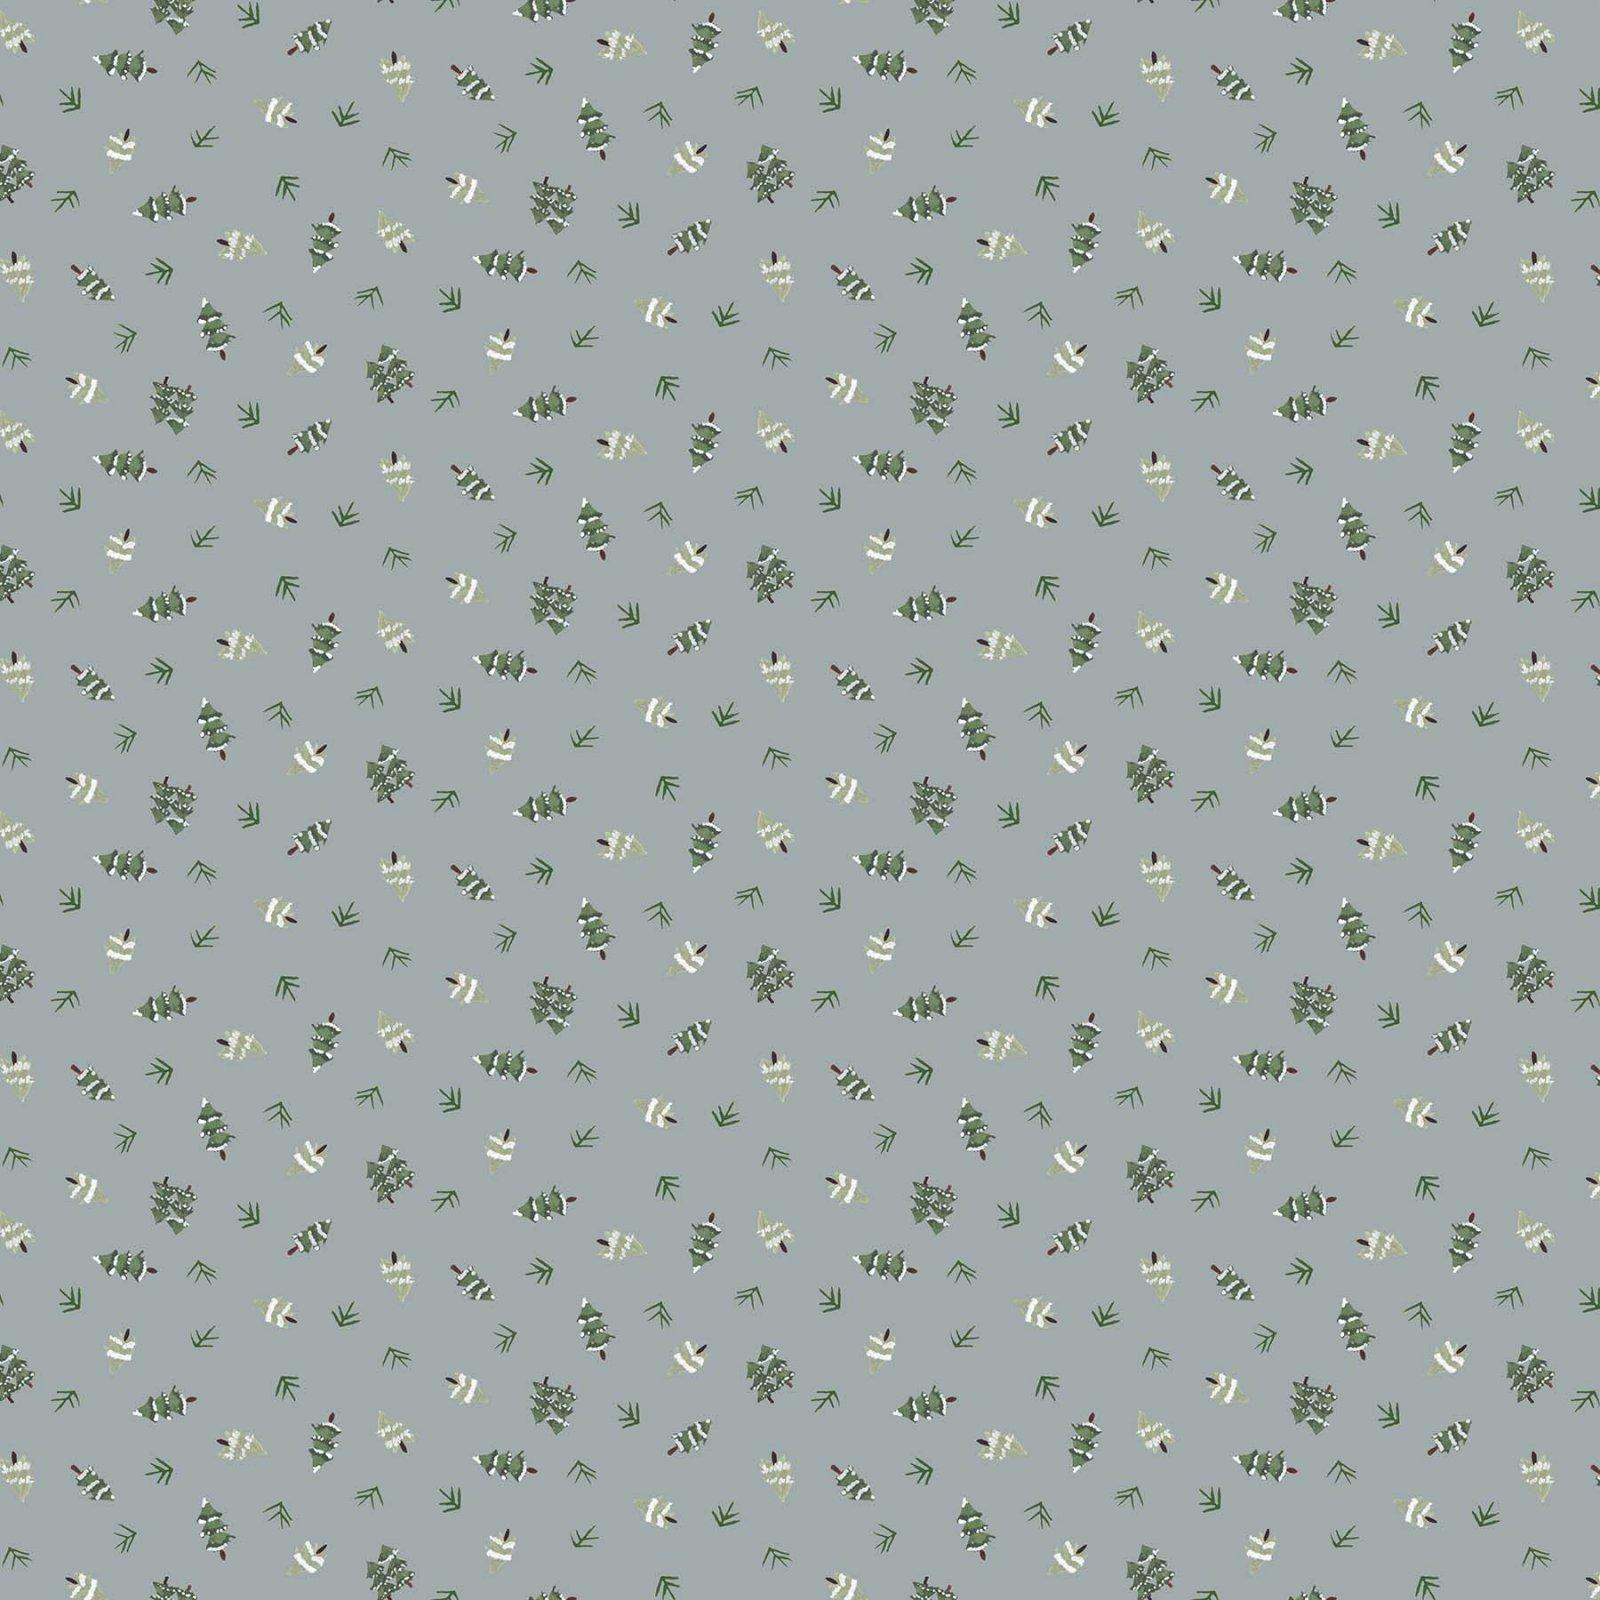 Winter Frost by Boccaccini Meadows for Figo Fabrics - Trees - Grey